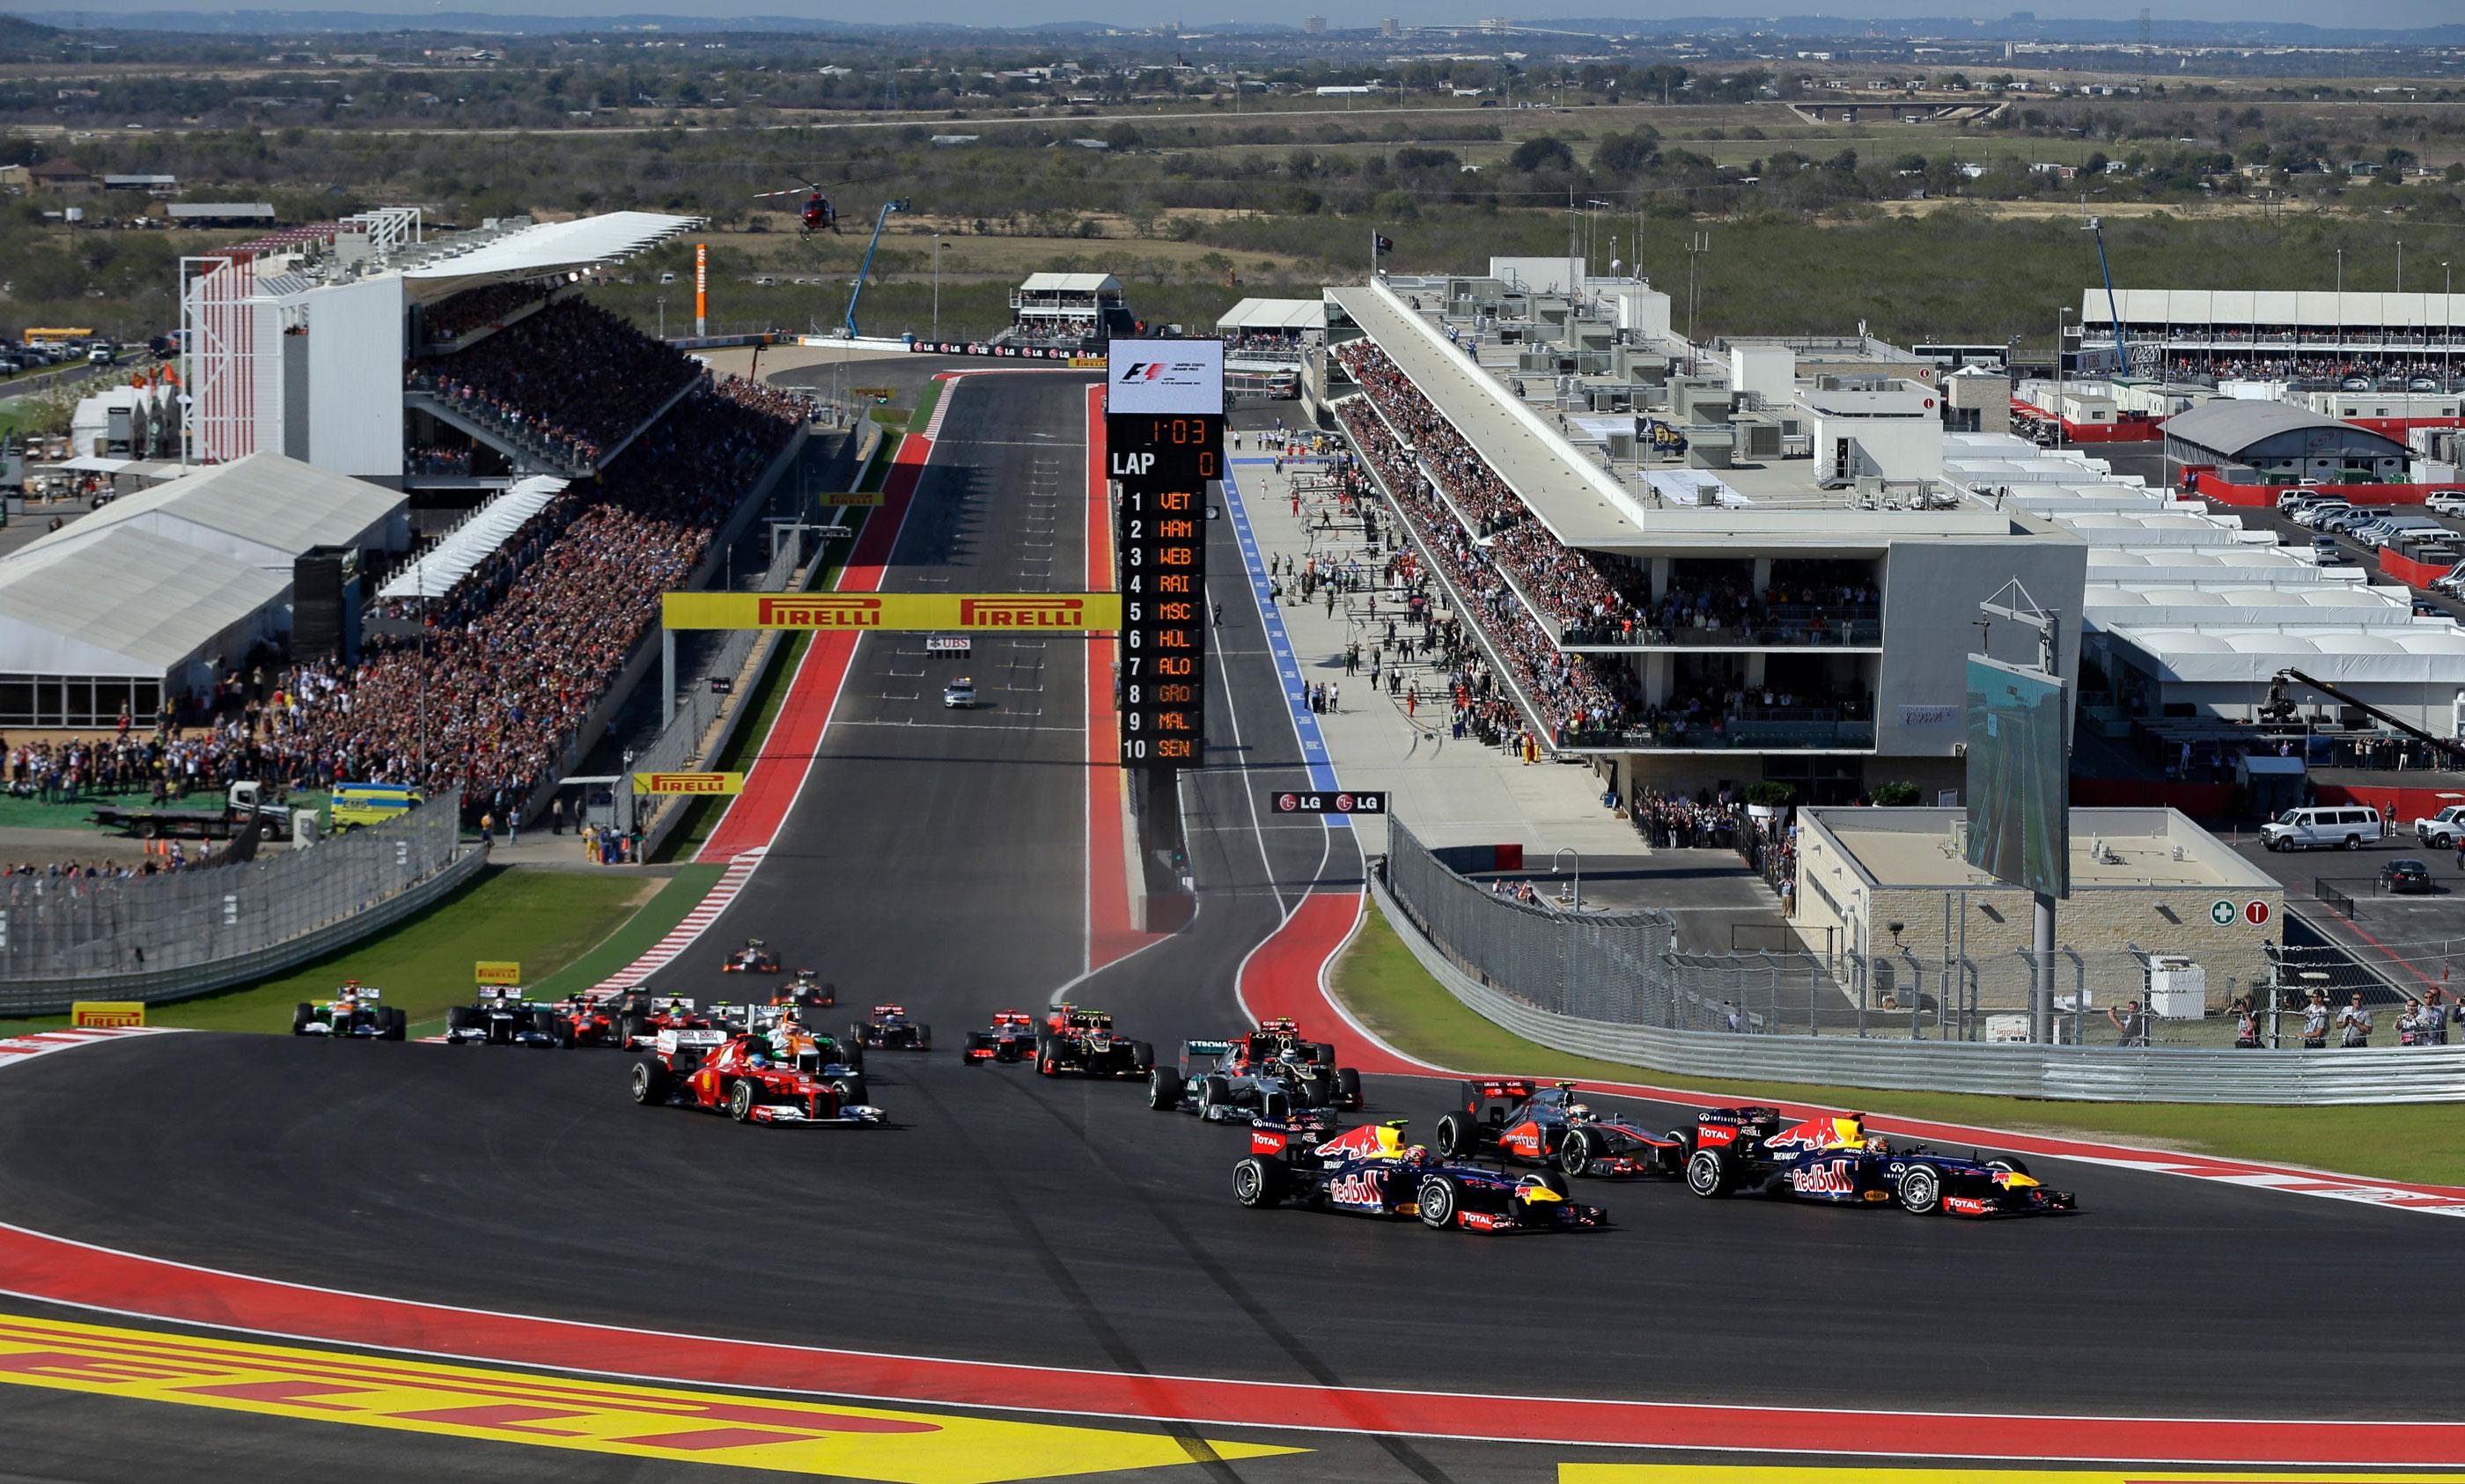 Formula 1 is winning America's hearts